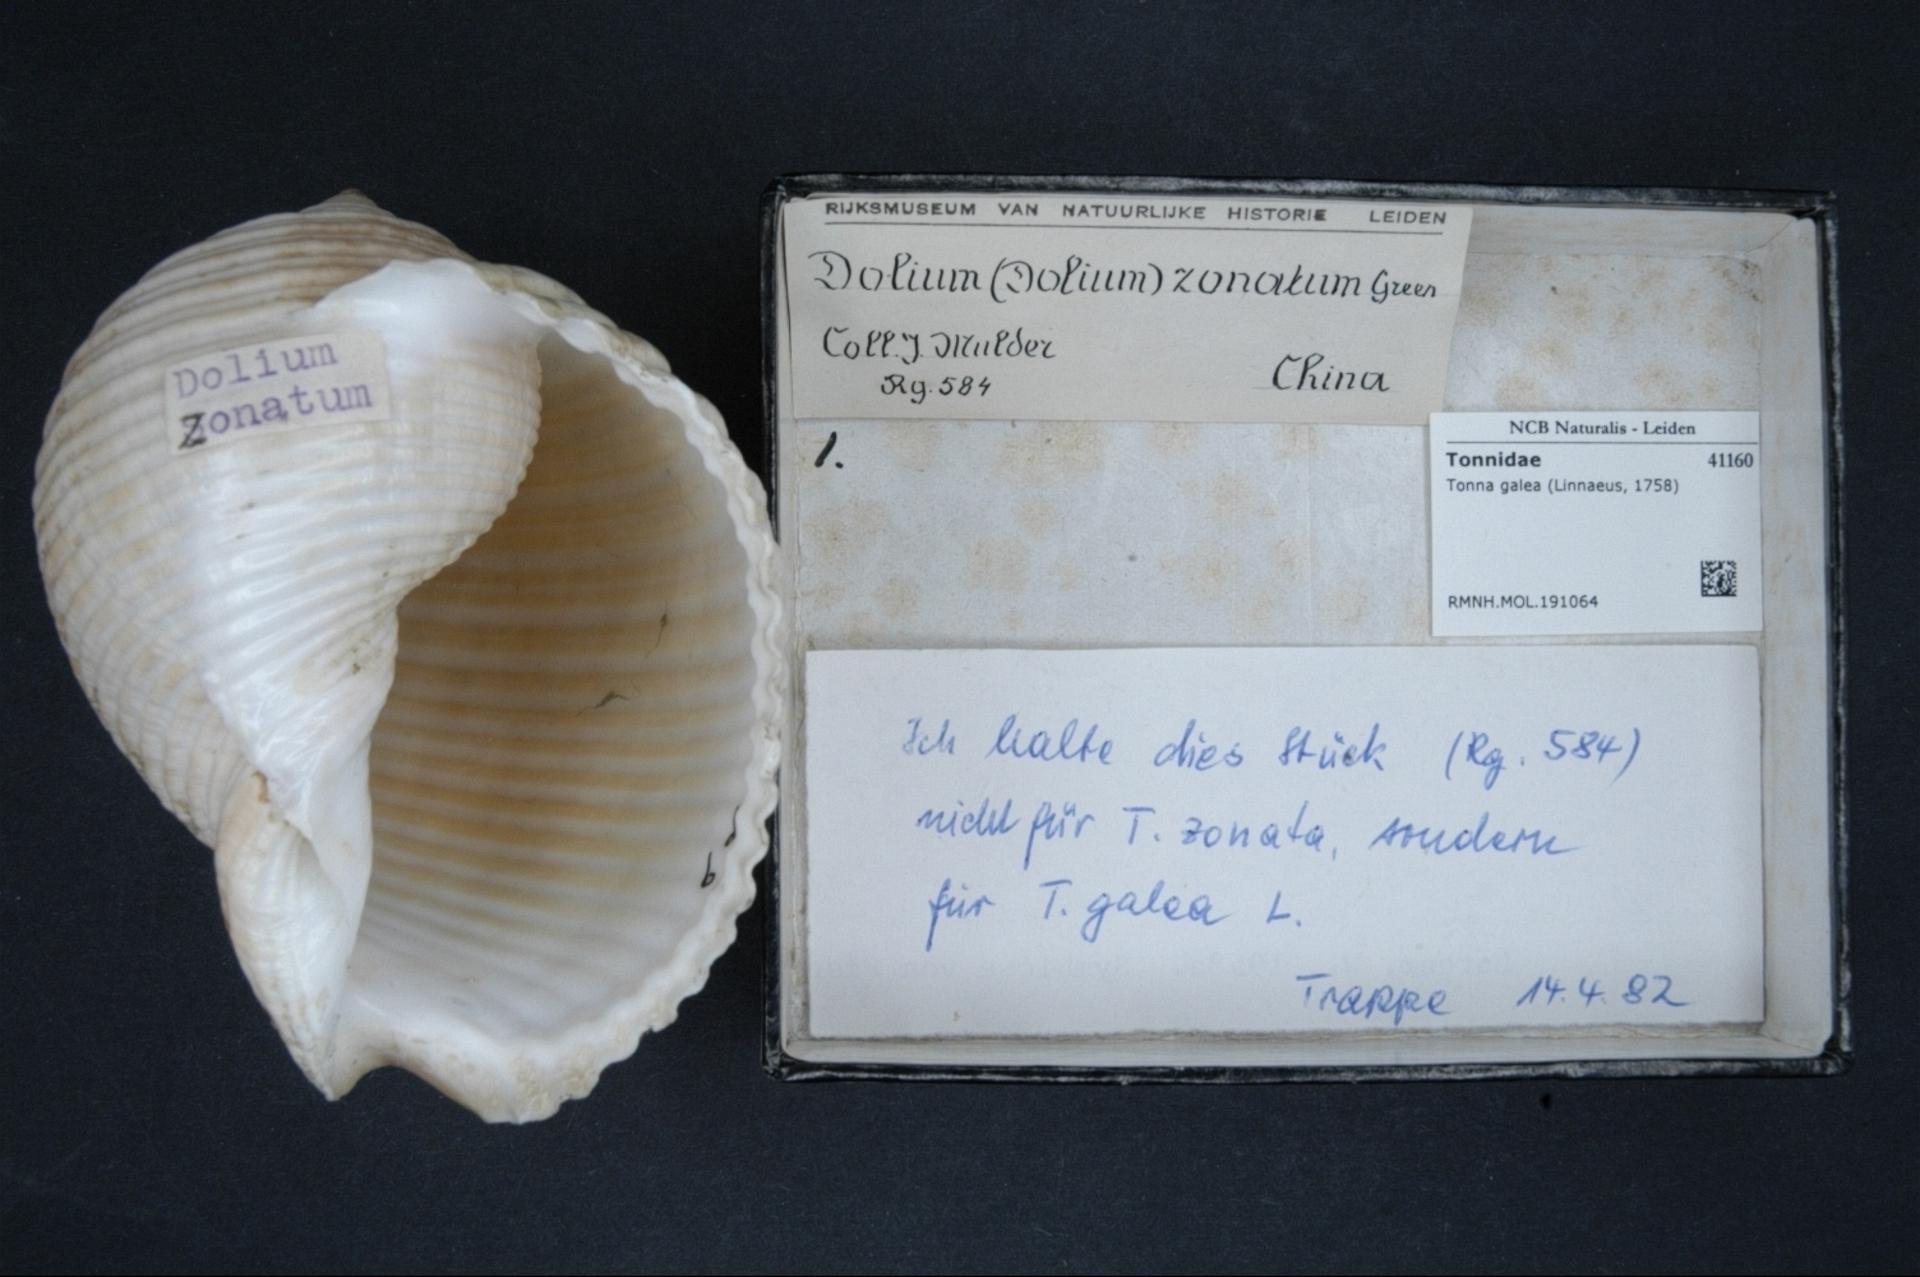 RMNH.MOL.191064 | Tonna galea (Linnaeus, 1758)